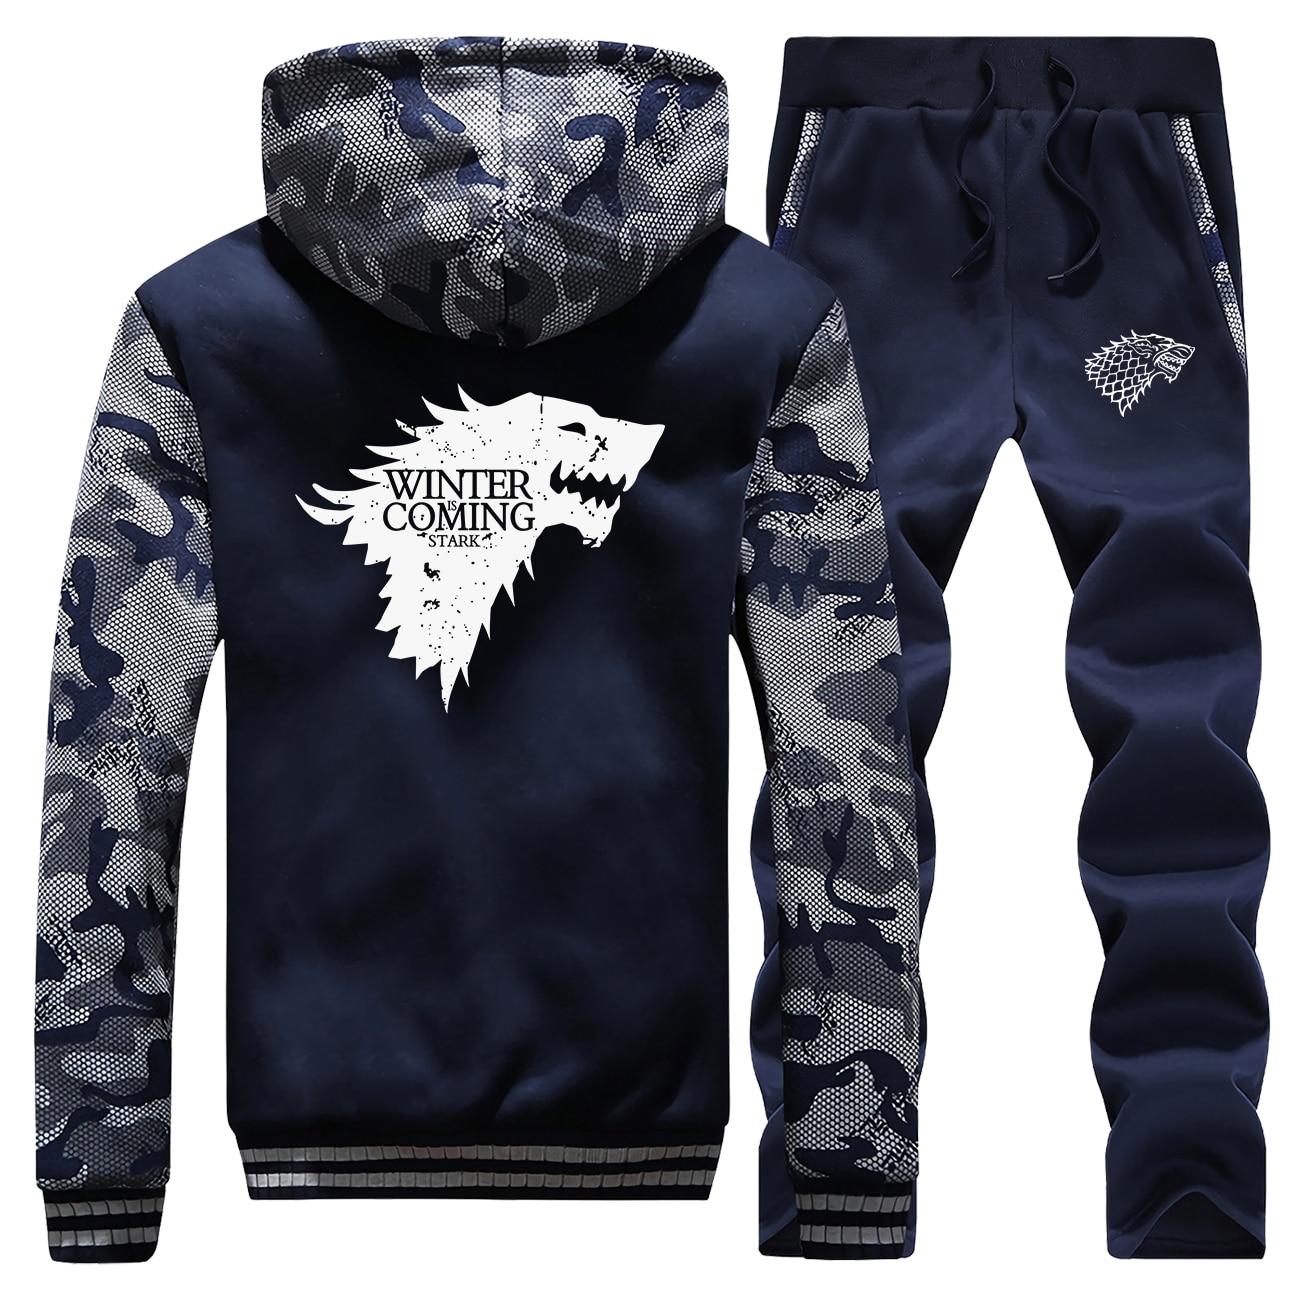 Winter Is Coming Hoodie Sweatshirts Sets Men Tracksuit Wolf Jacket+Pants 2 Piece Set Mens Camouflage Hoodies Trousers Warm Suit